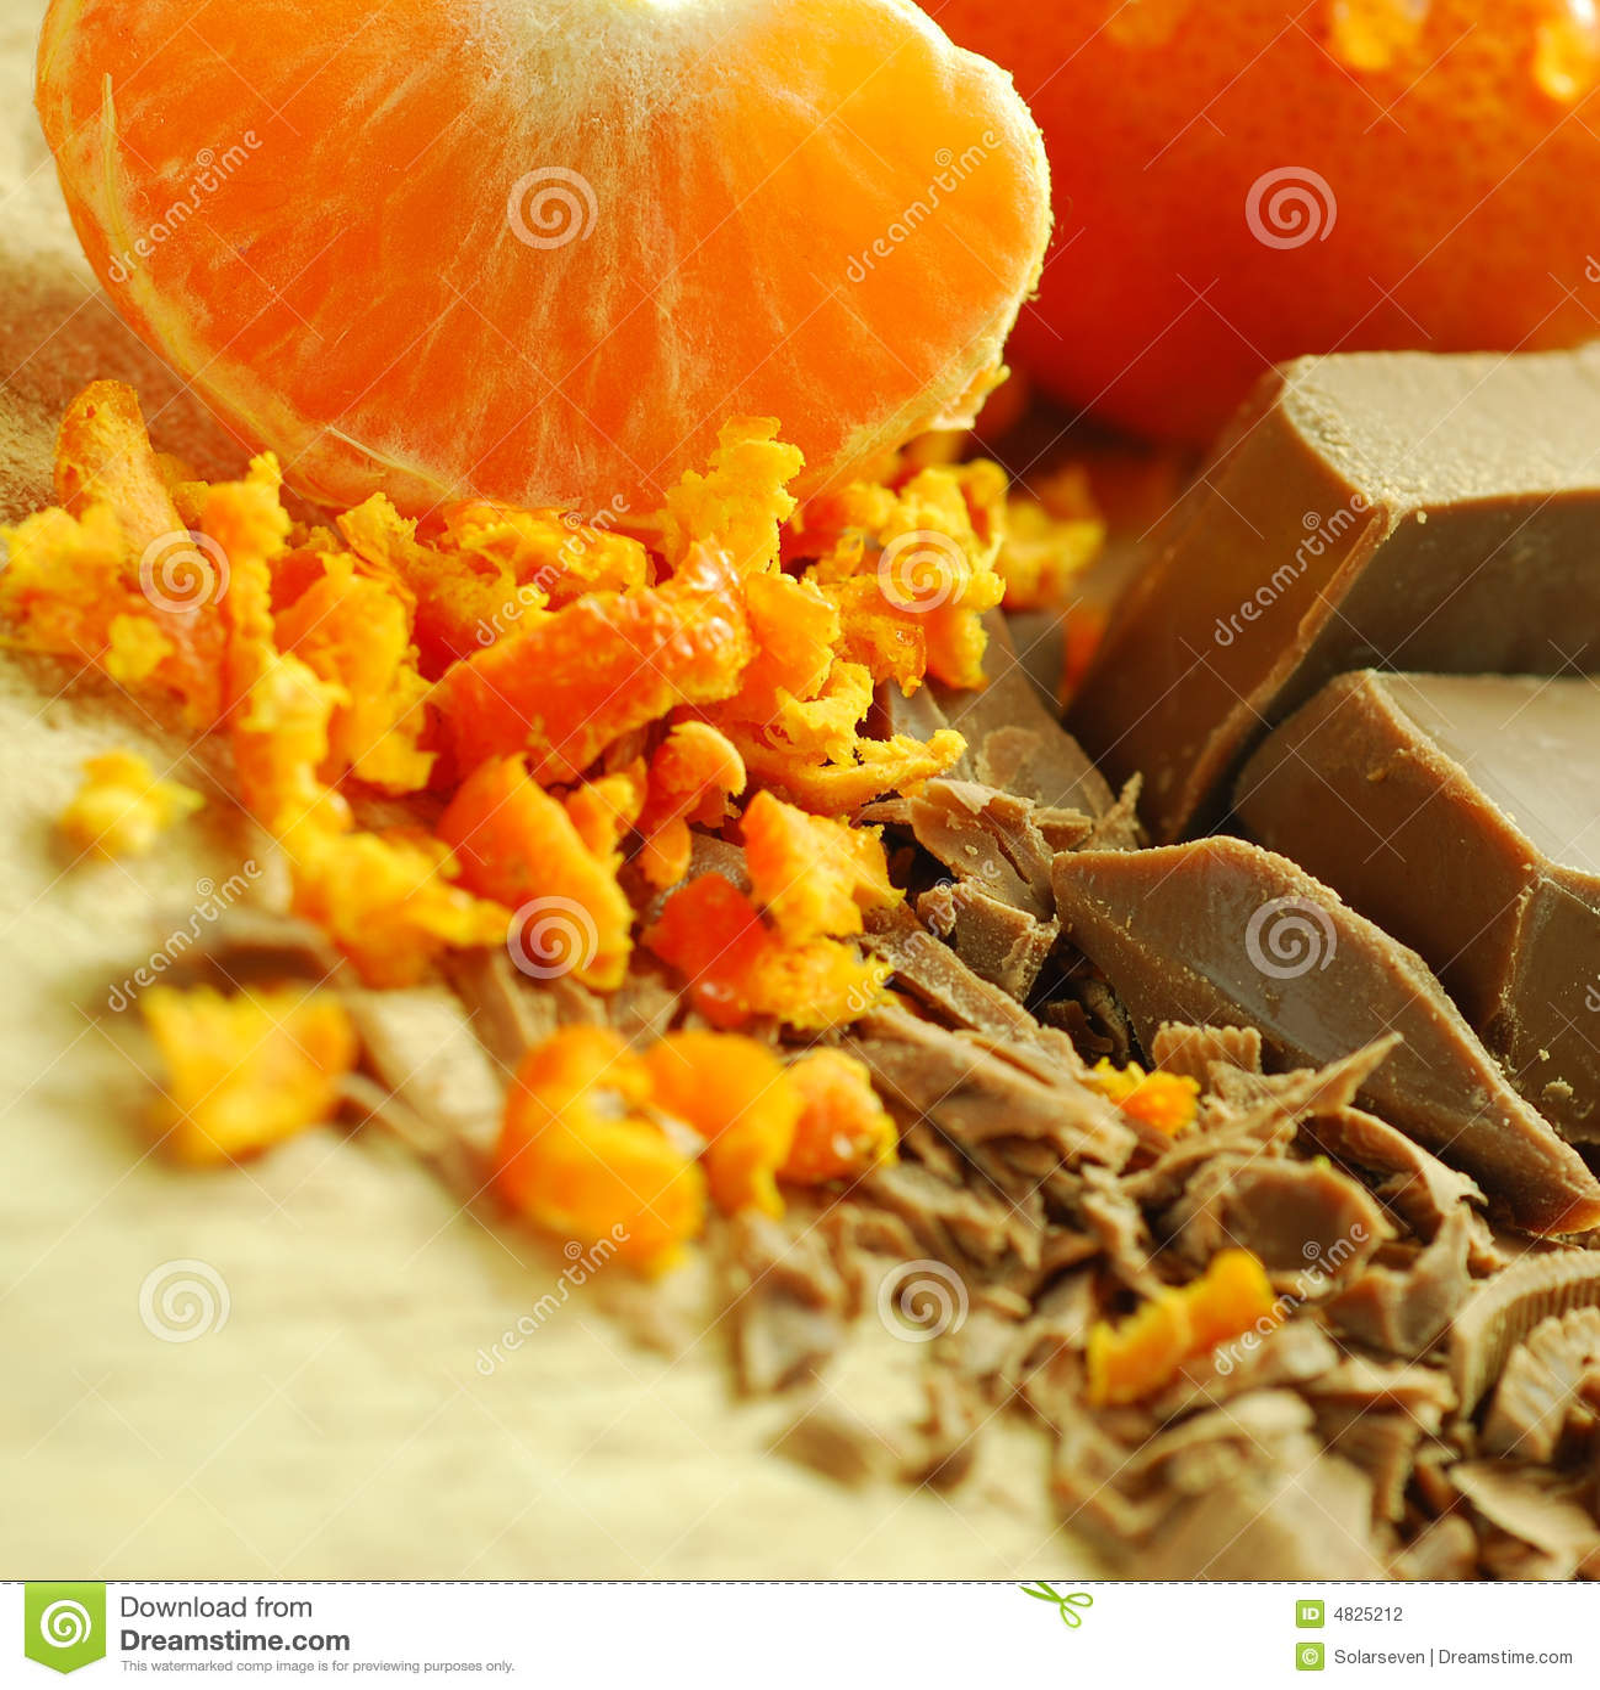 Chocolate flakes and Orange